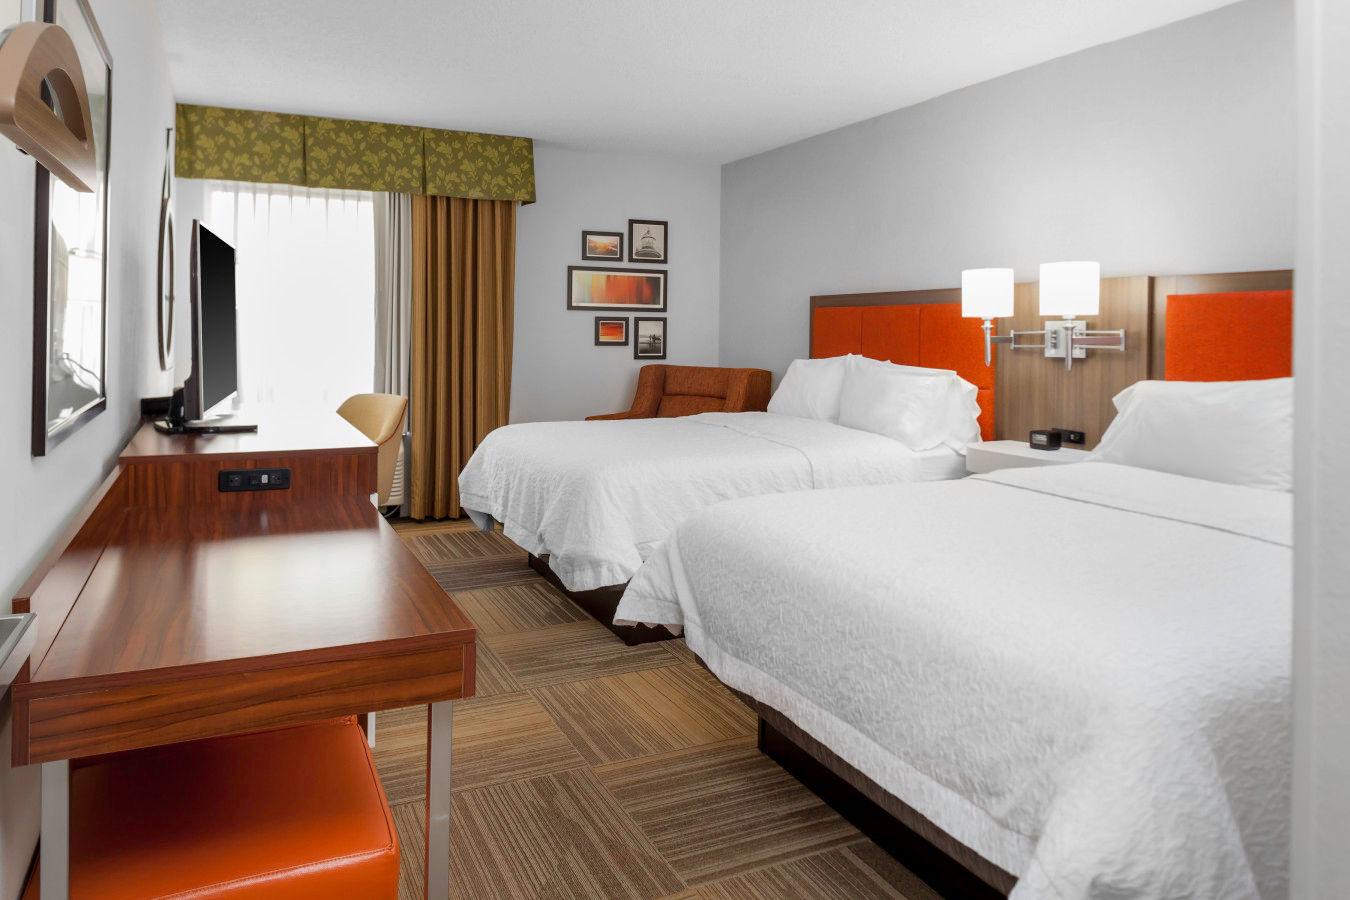 Two - Queen double bed room.